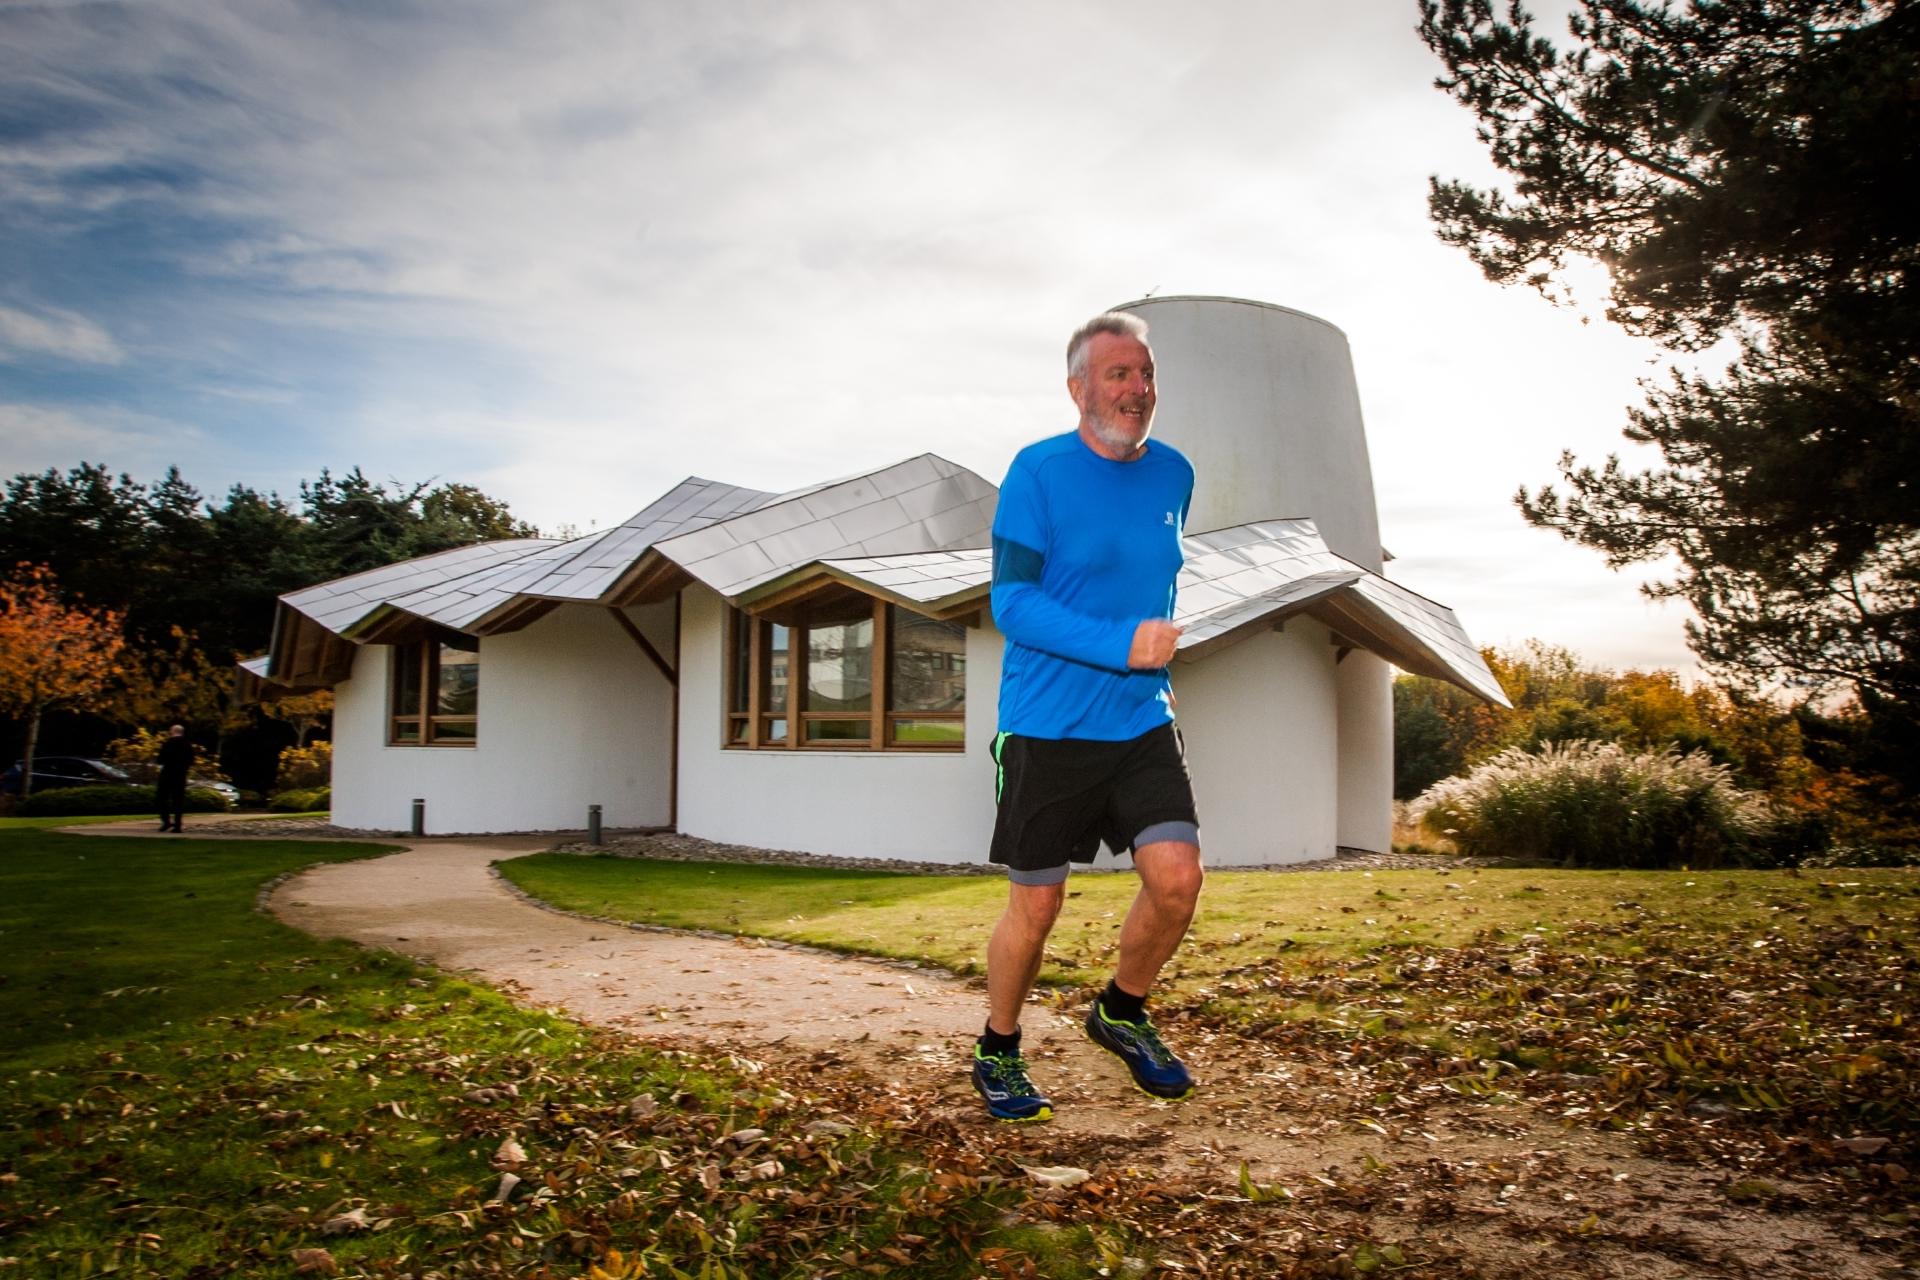 Eric Hamilton runs past Maggie's Dundee during training for the 2017 London Marathon.